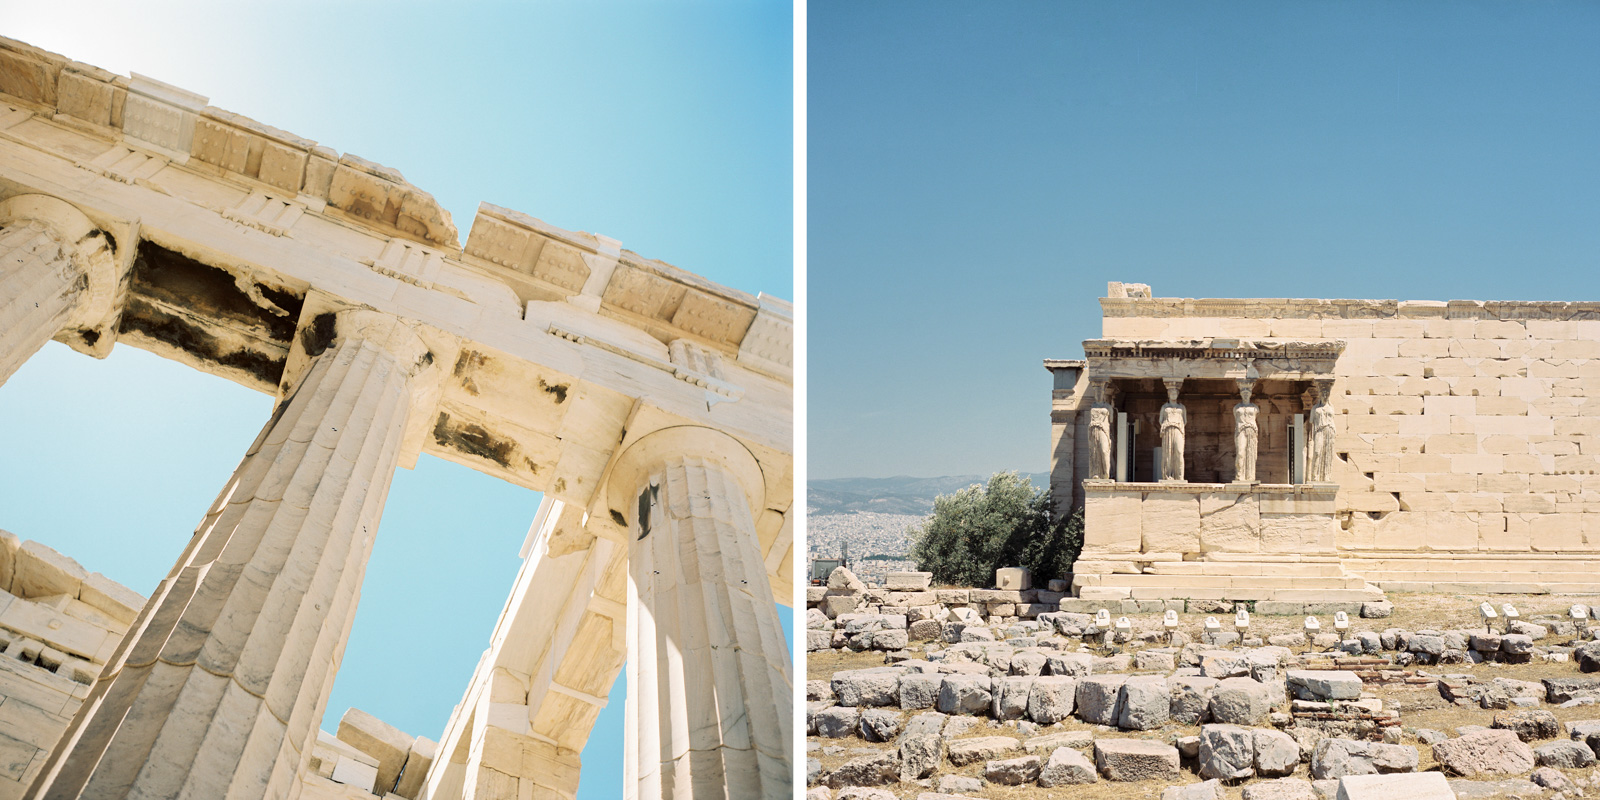 Greece_Parthenon_Yashicamat124g_02.jpg